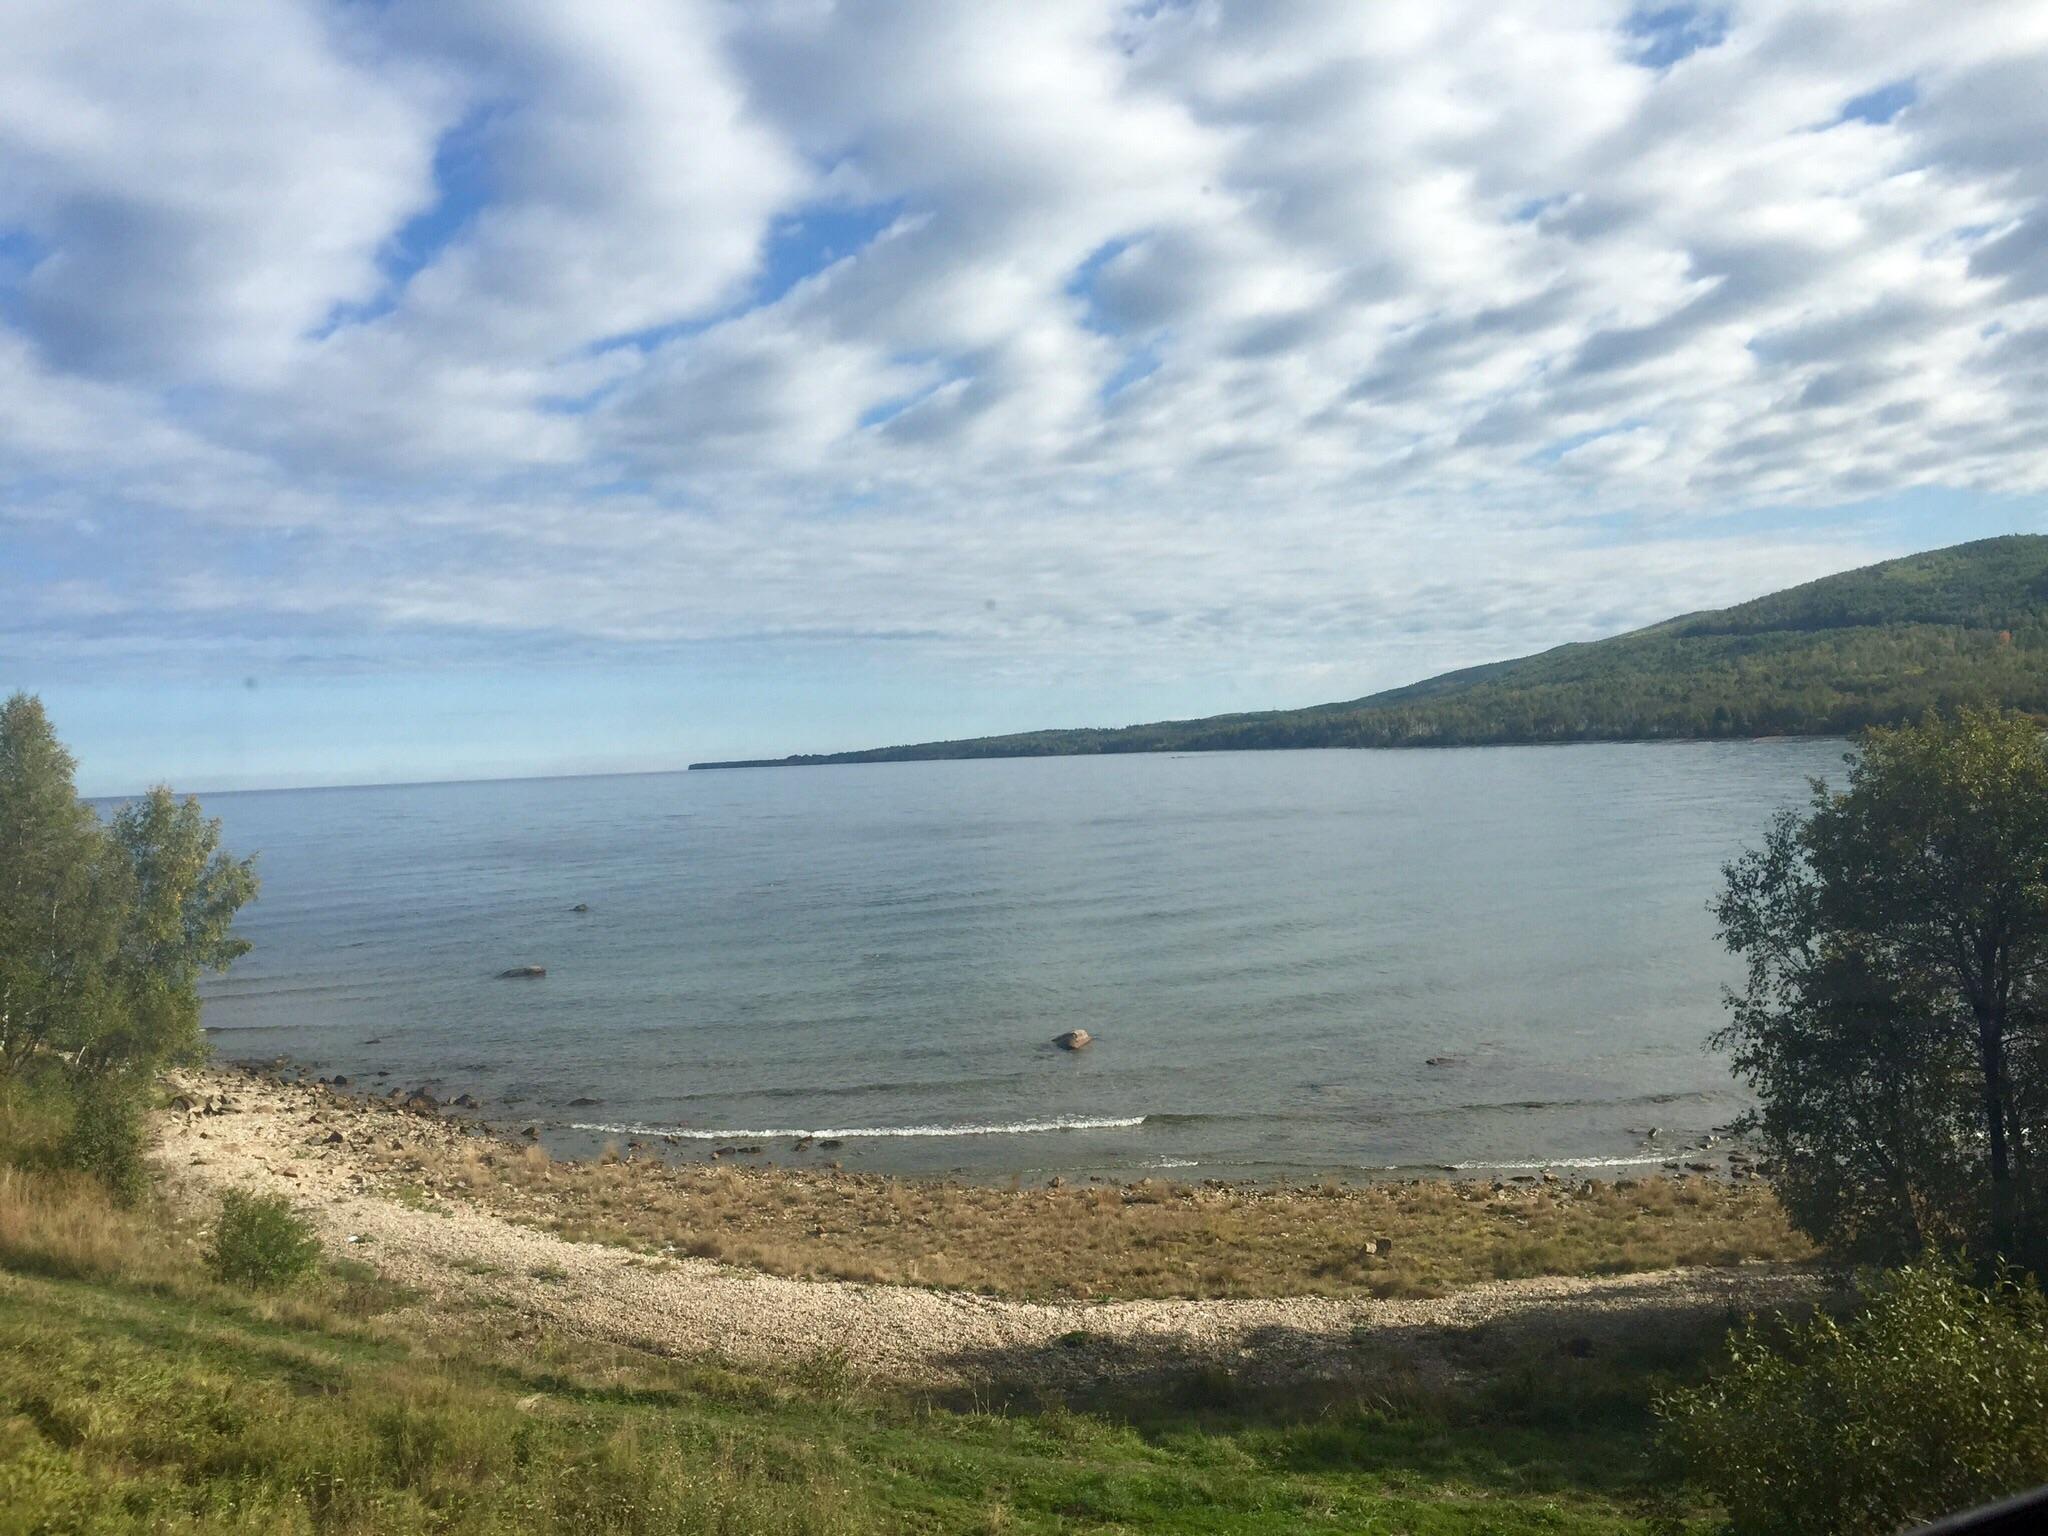 We have arrived at Lake Baikal